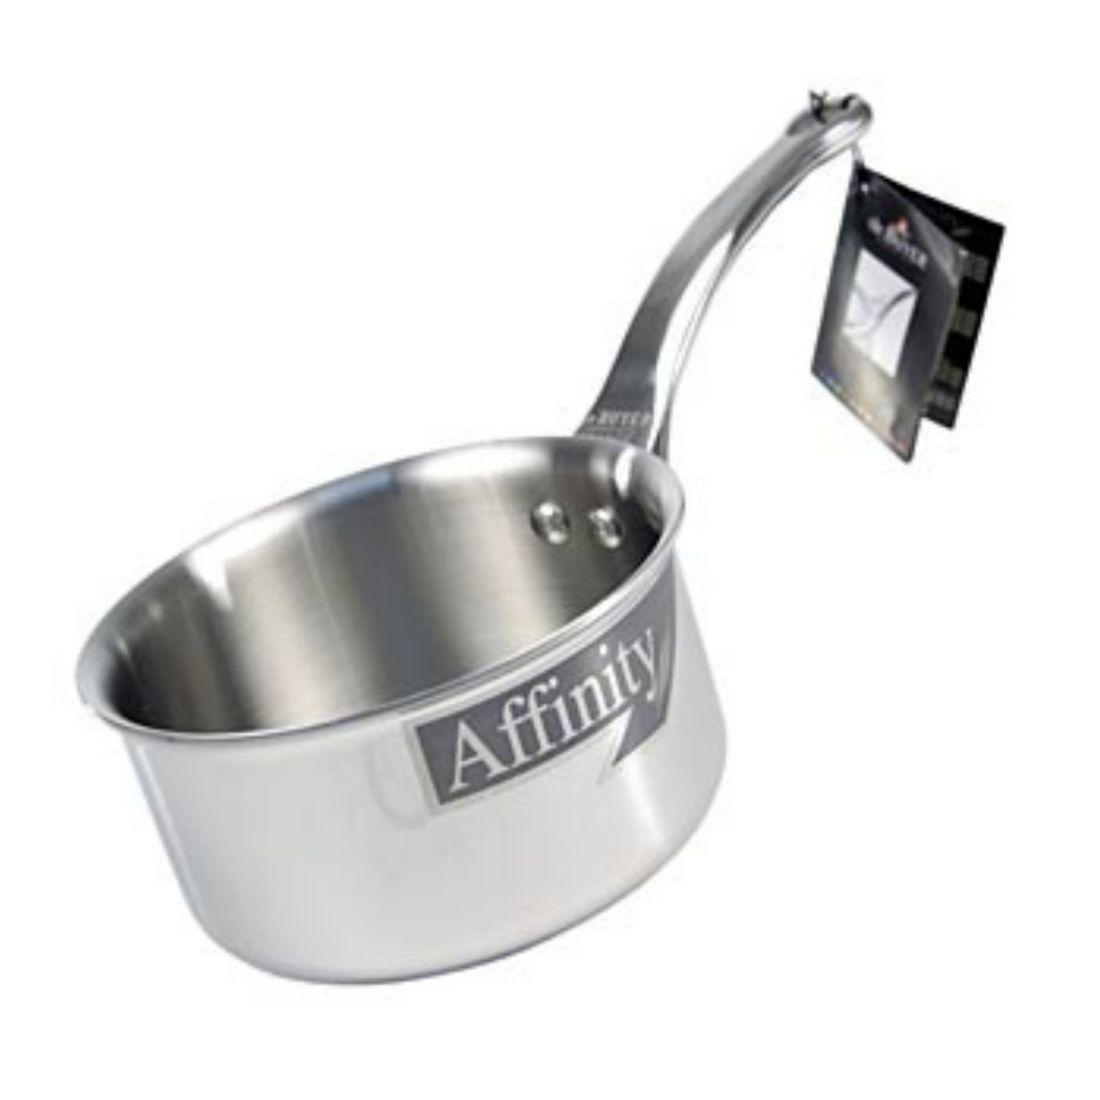 Rendlík Affinity 2,5 l